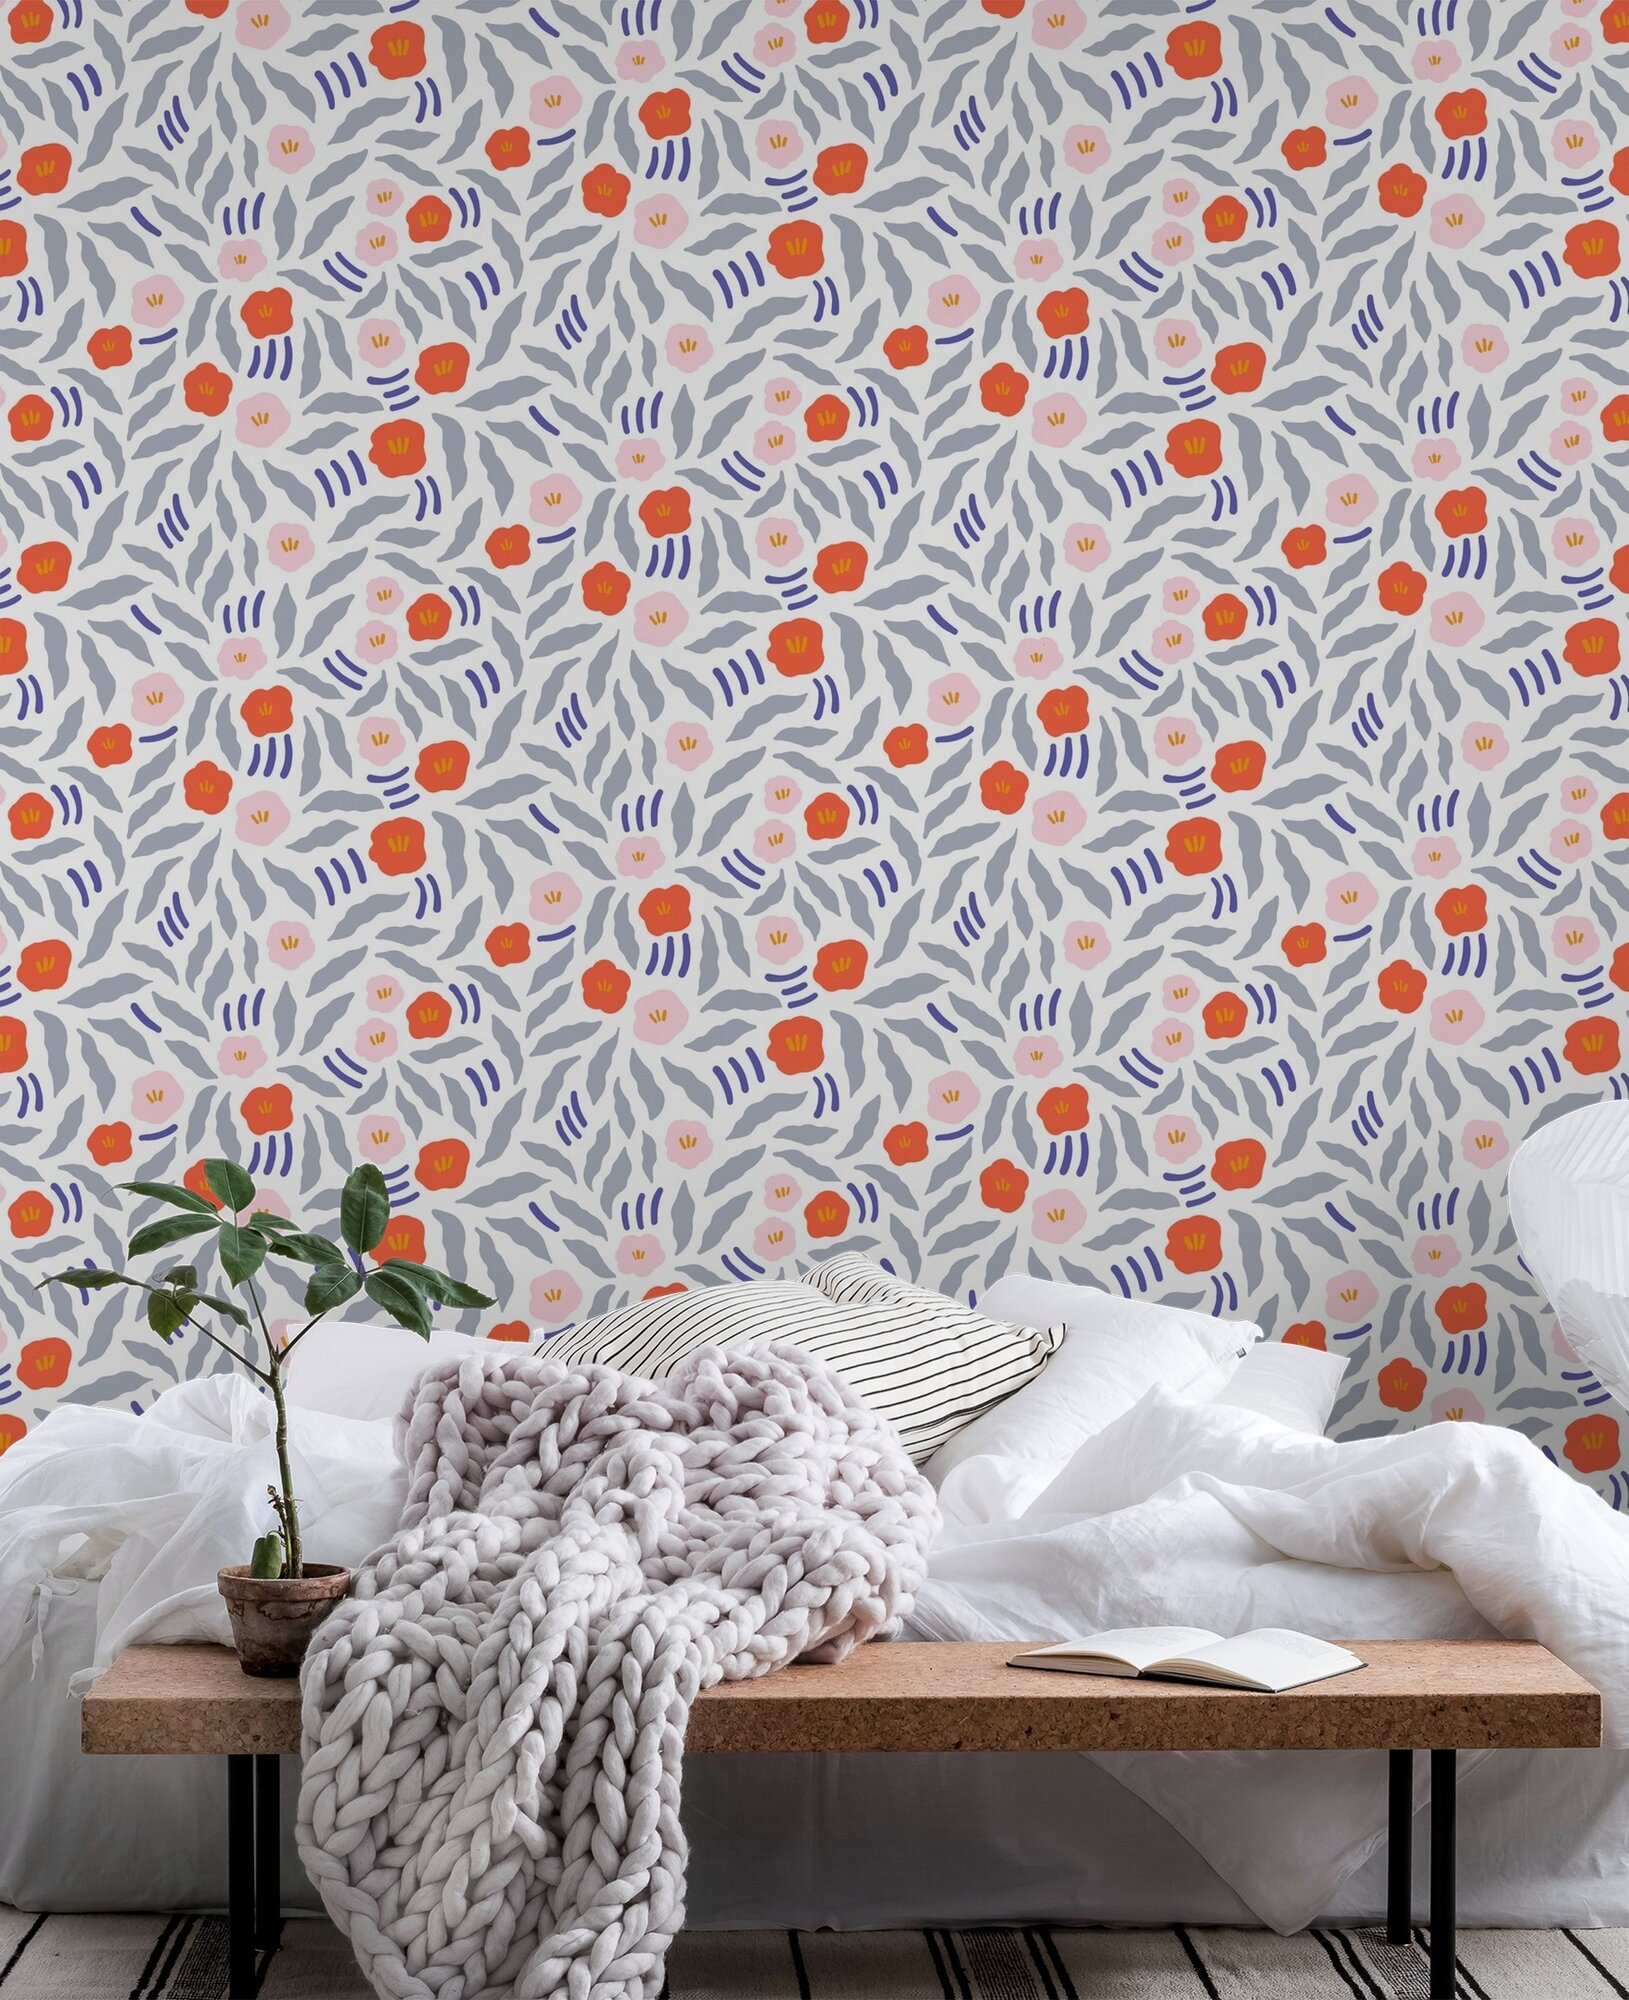 Wallpaper - Happywall